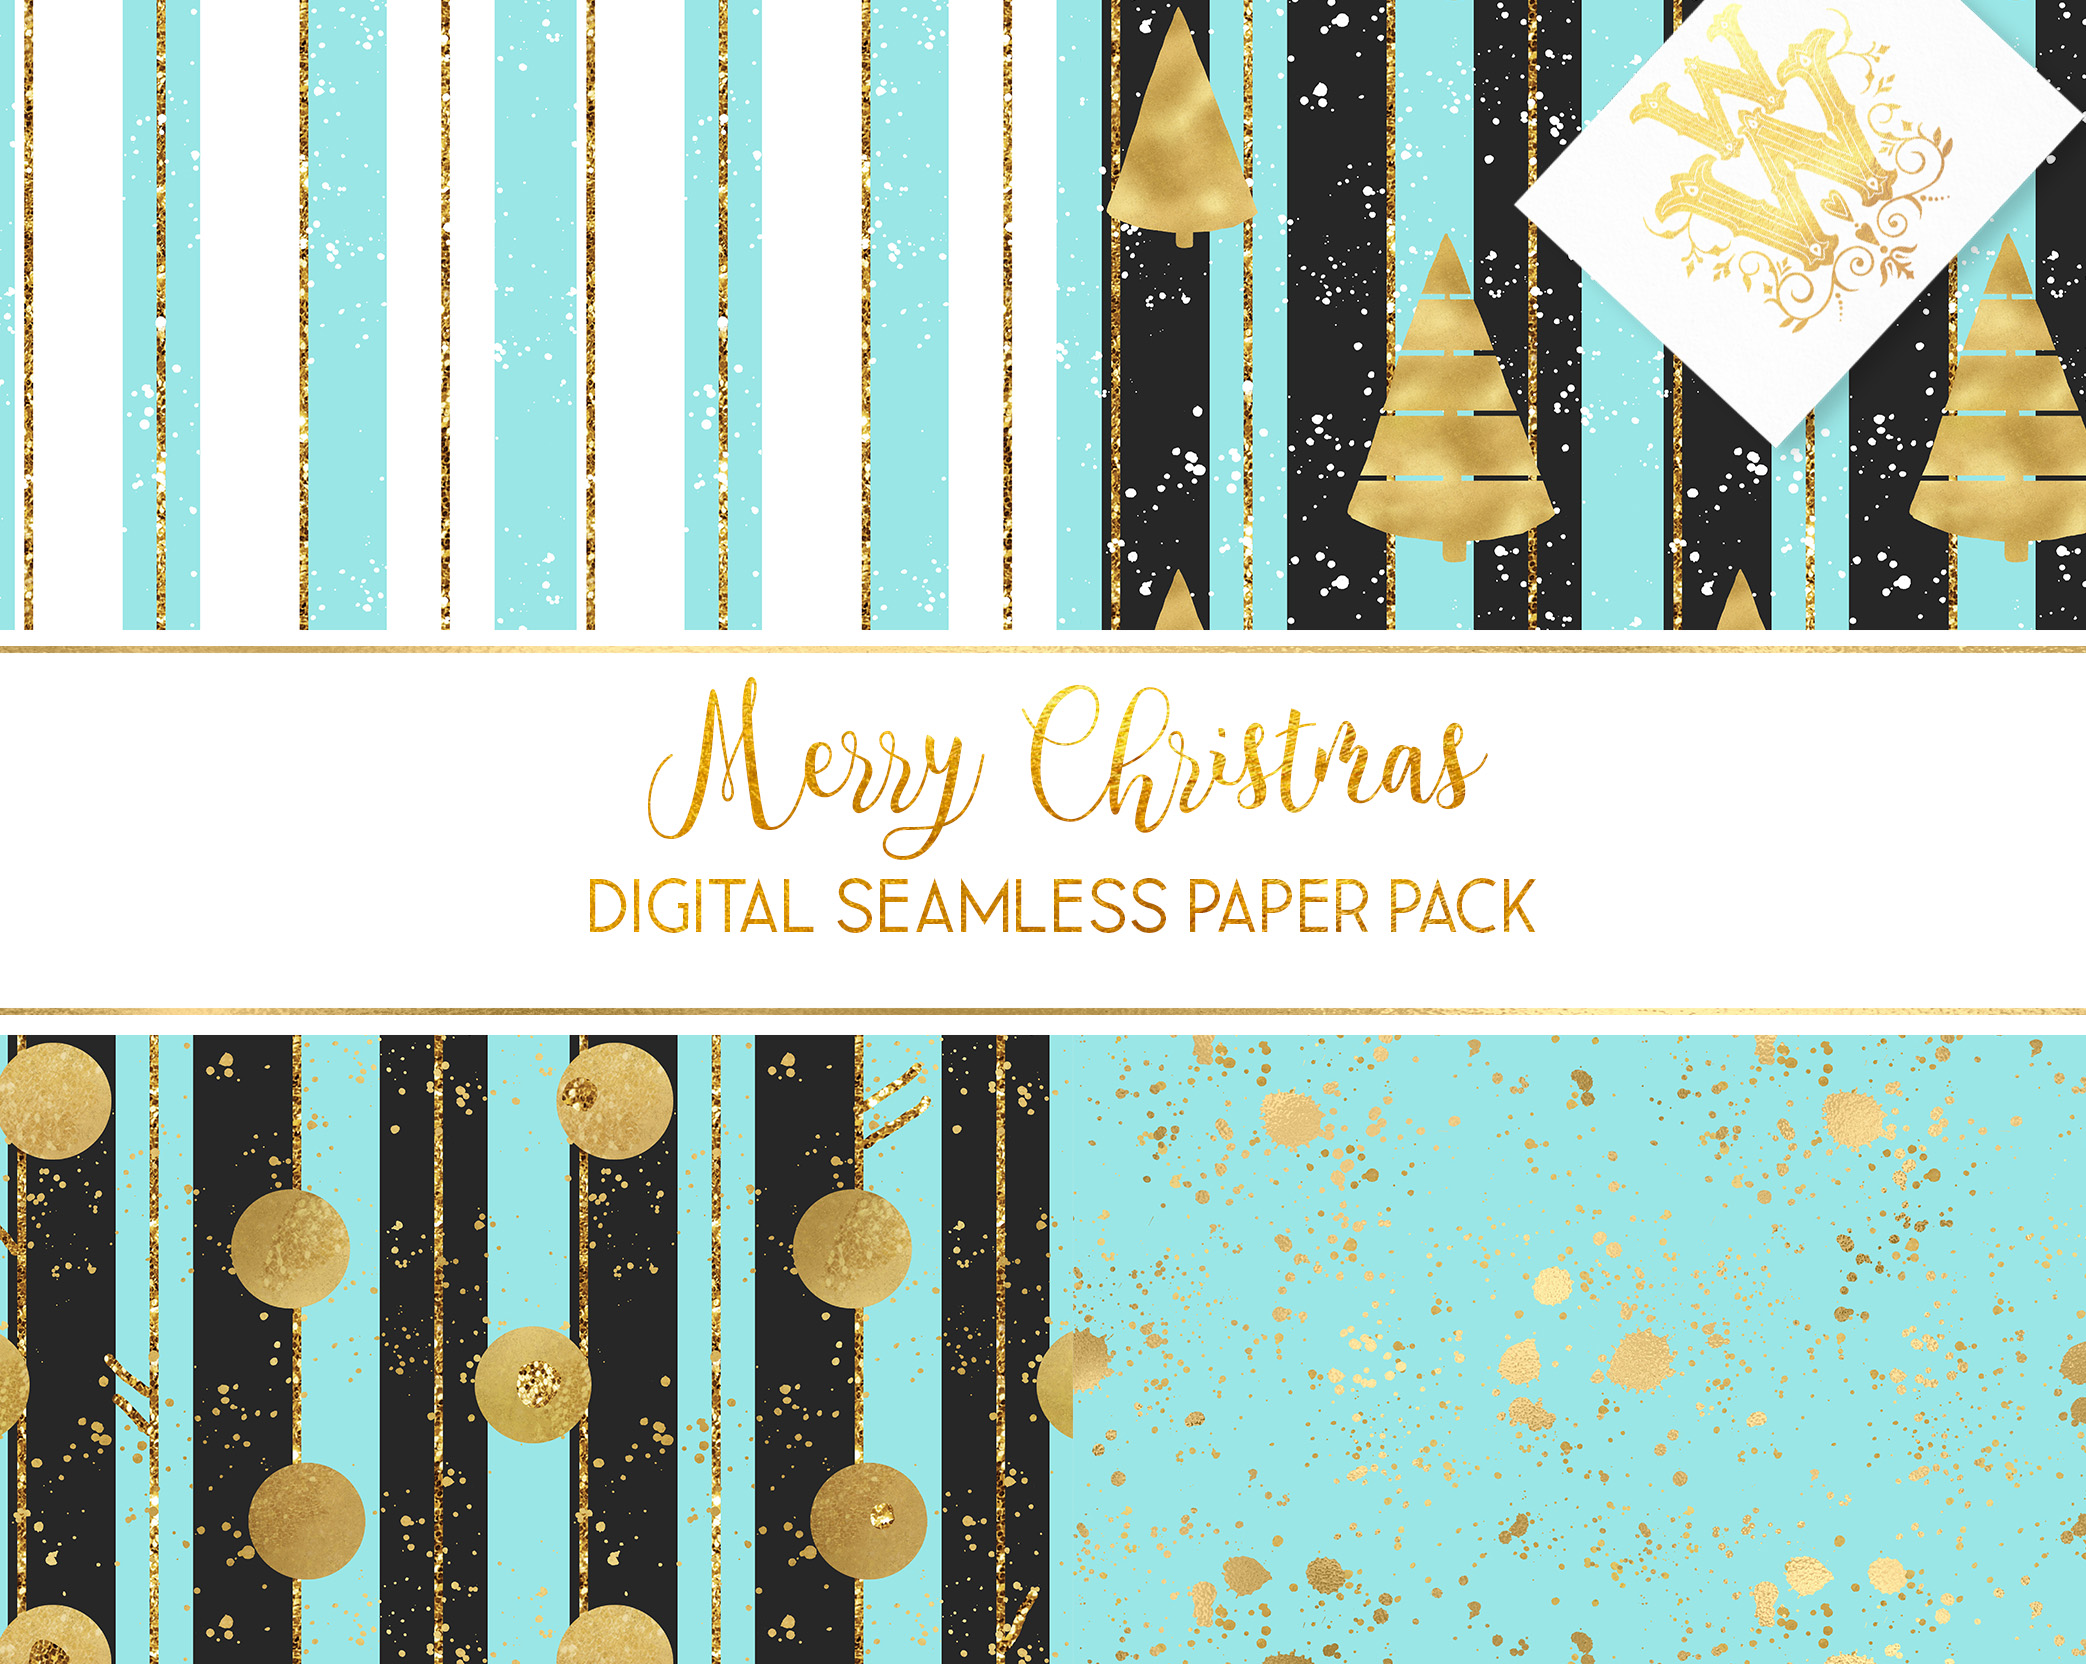 Christmas digital paper pack, seamless pattern snowflake example image 6